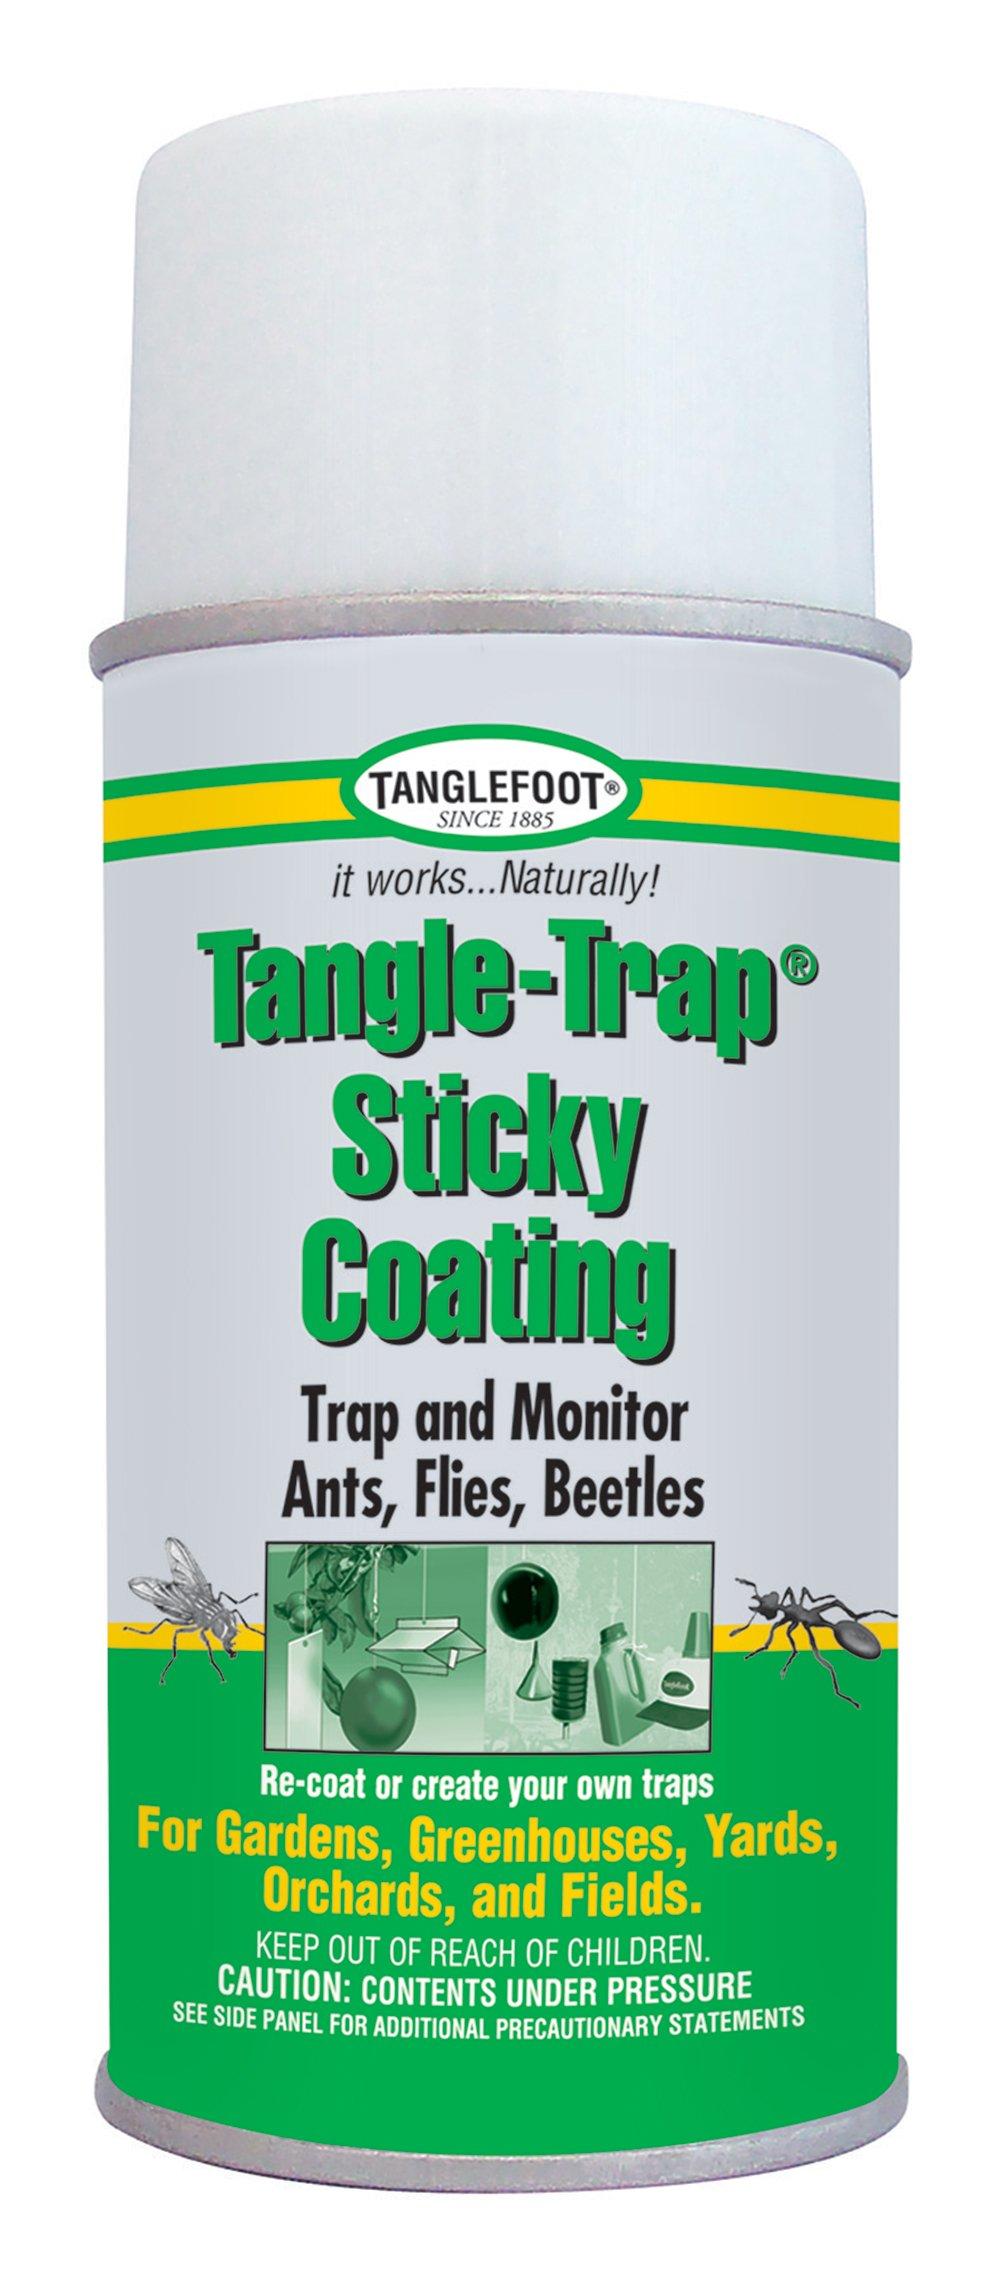 Tanglefoot Tangle-Trap Sticky Coating Aerosol